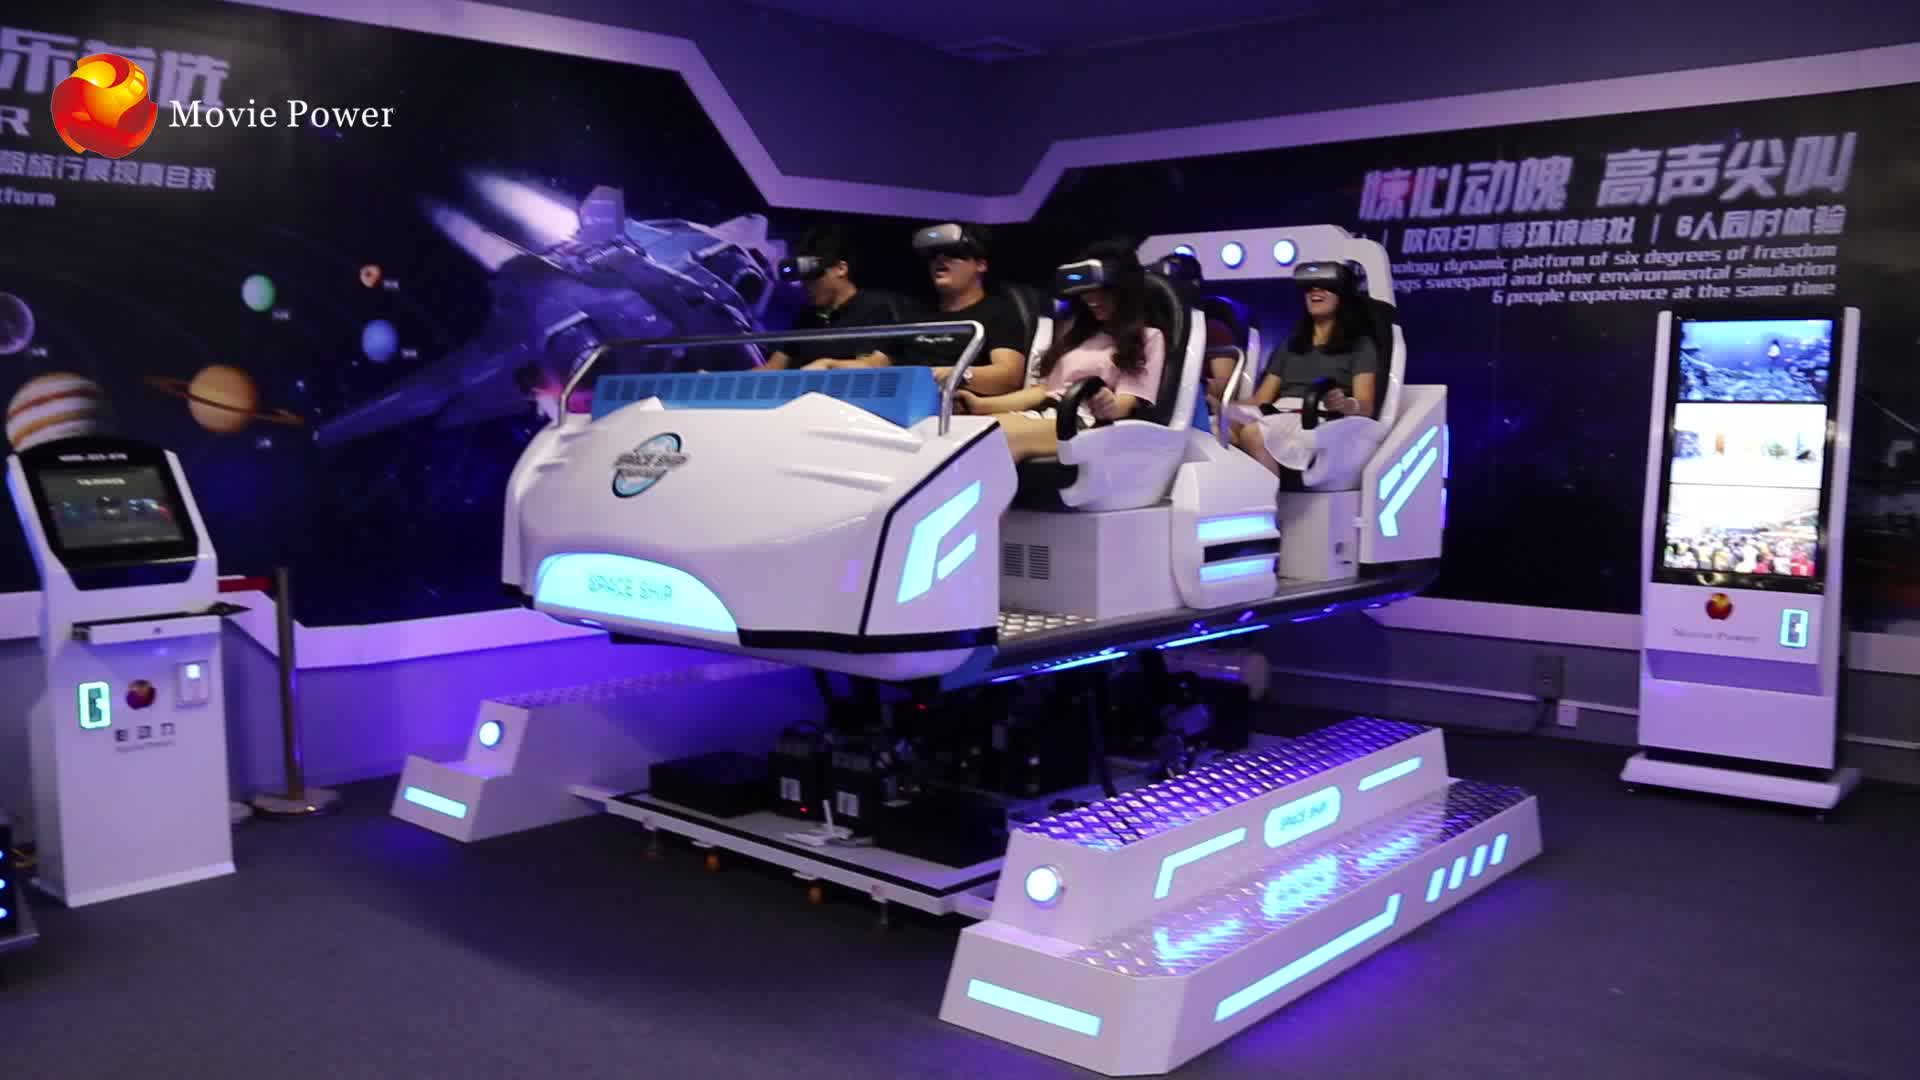 Cool Spaceship Shape 6 Seats 9D Vr Motion Simulator 4 dof Game Machines 9D Cinema Virtual Reality Chair Equipment